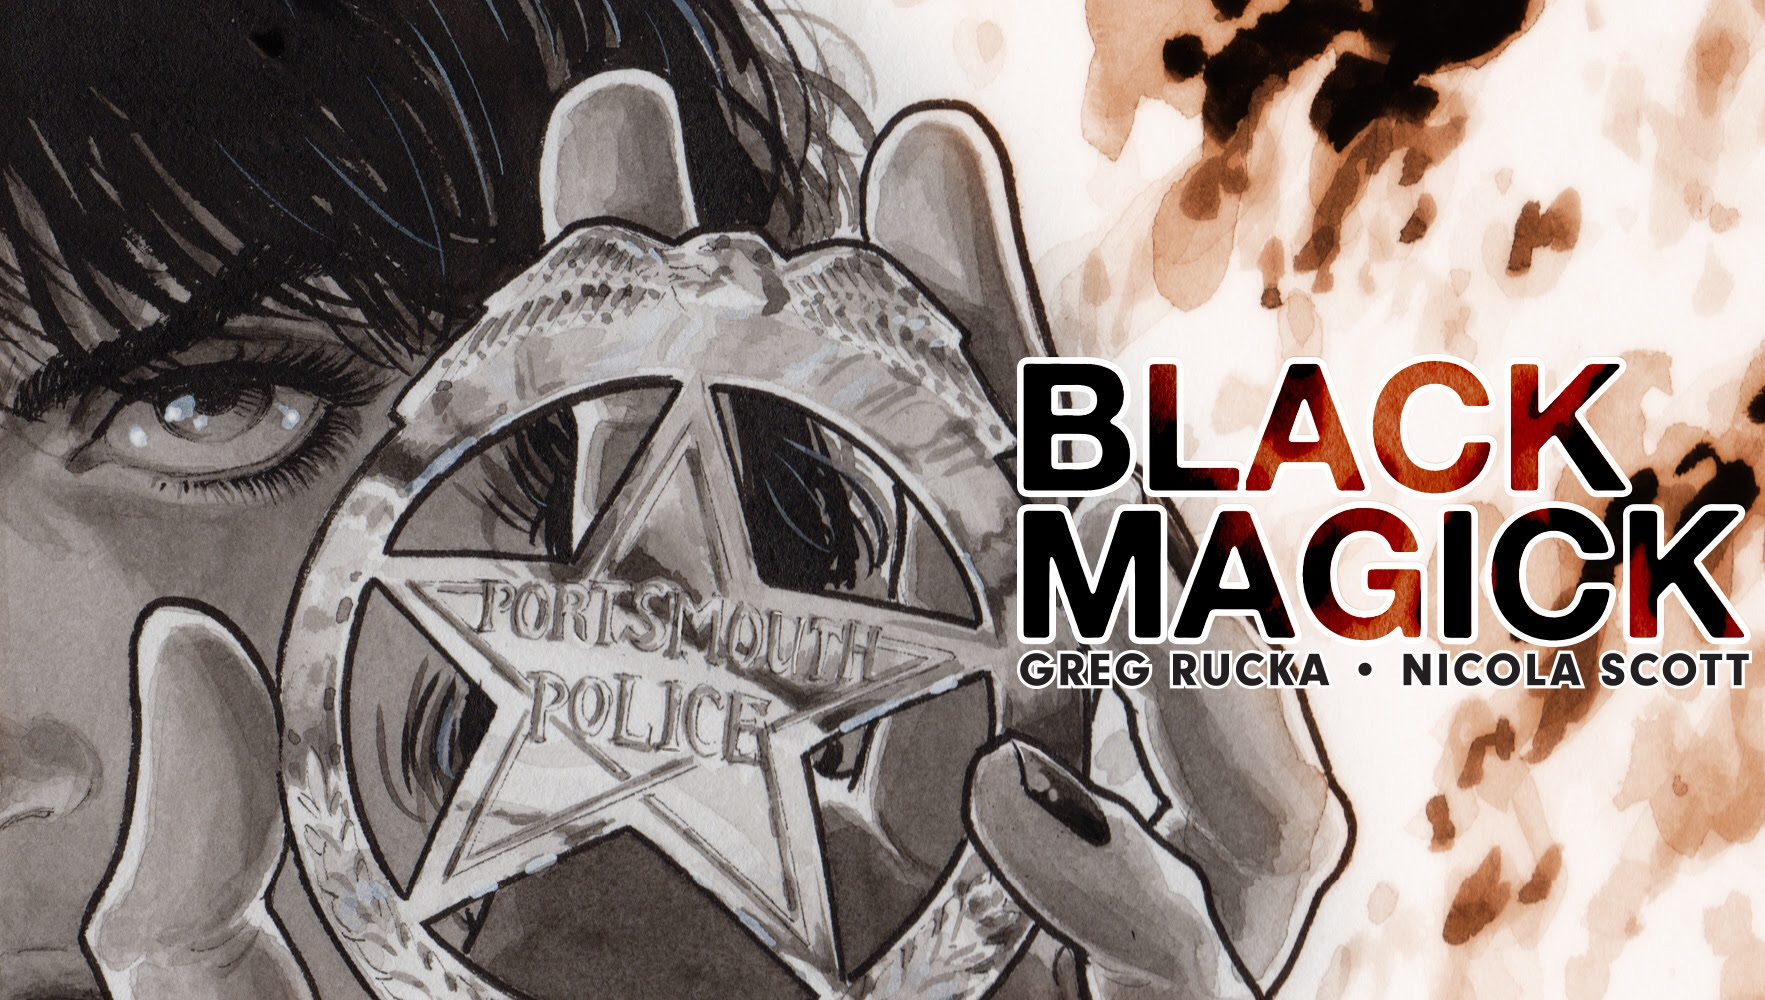 Image Comics Conjures 'Black Magick' with Greg Rucka, Nicola Scott, Jodi Wynne, and Eric Trautmann